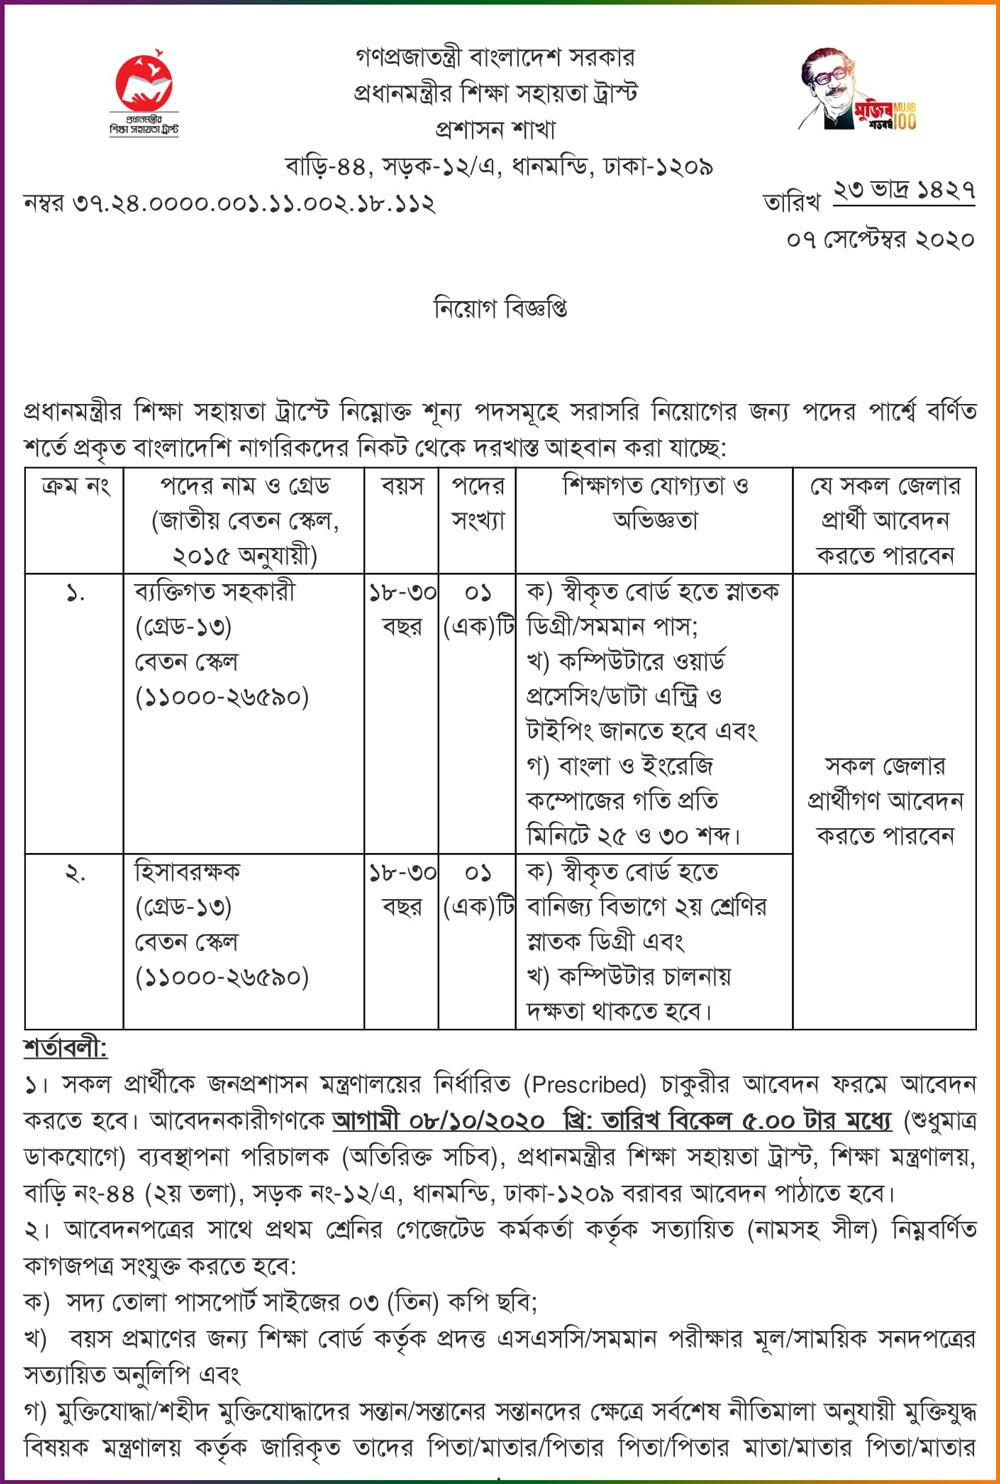 PMEAT Job Circular Apply 2020 - pmeat gov bd DPHE Job Circular